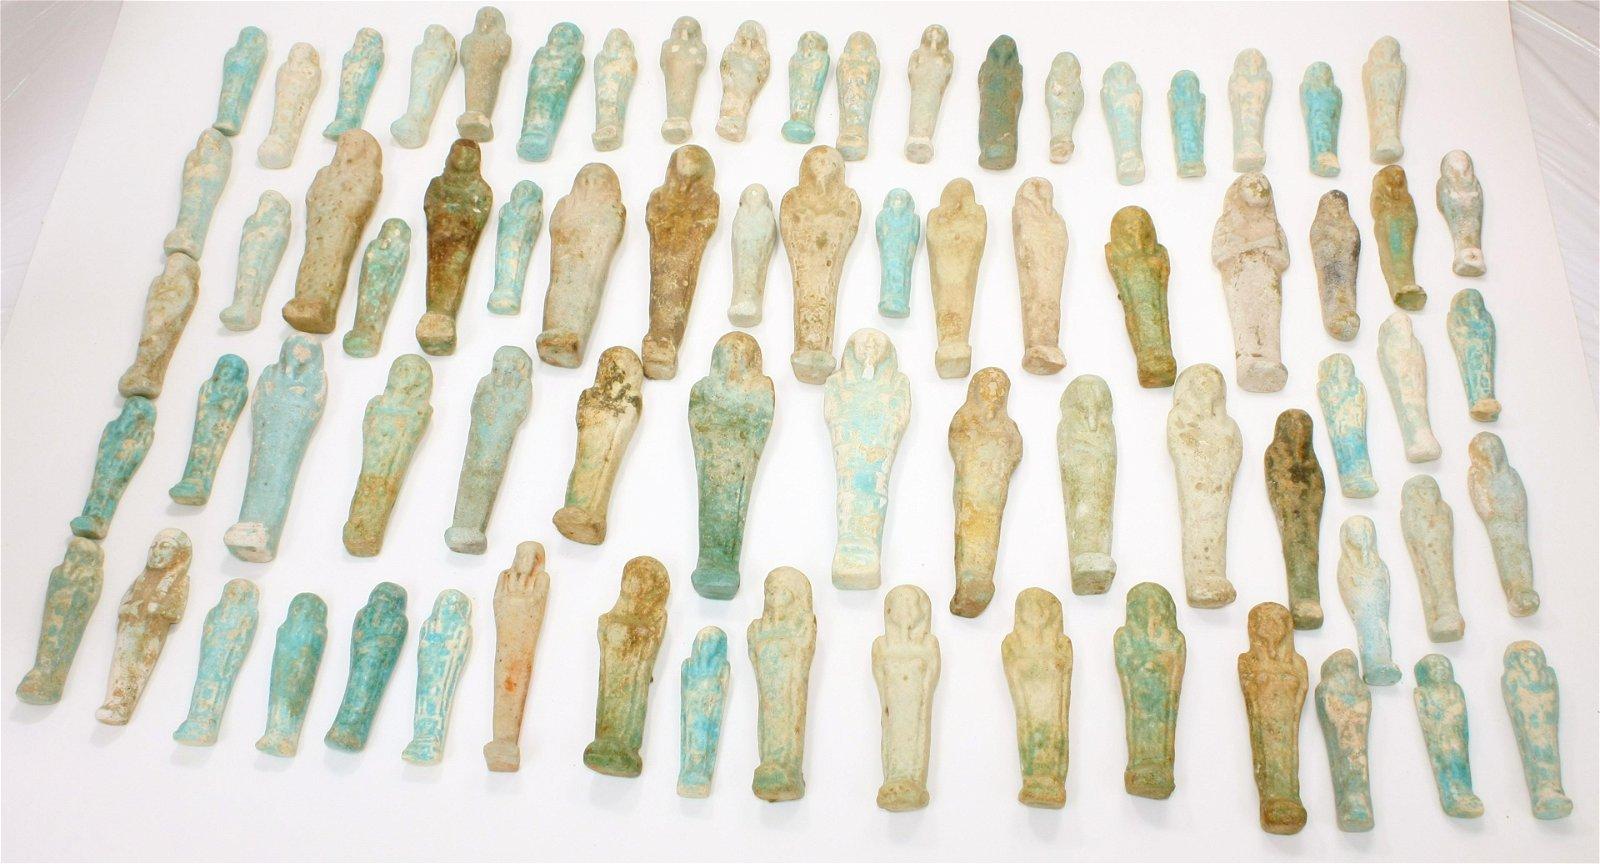 Lot of 73 Ancient Egyptian Faience Ushabti Figures